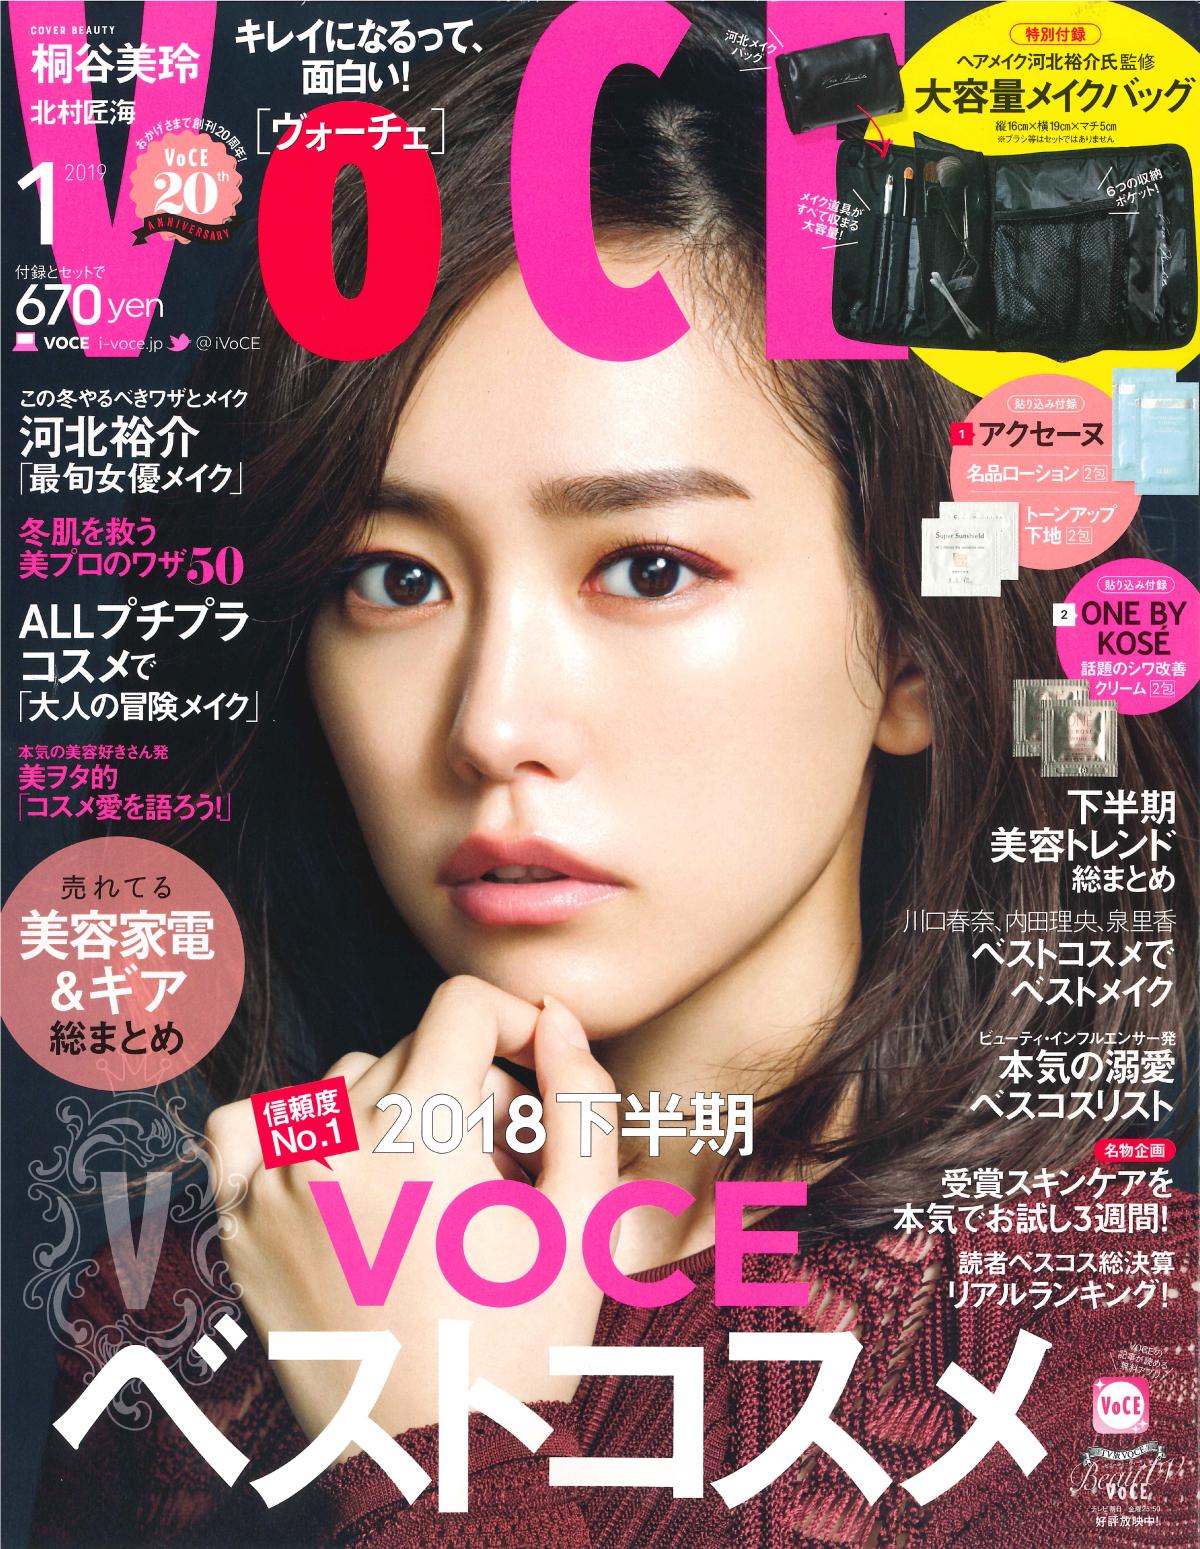 VOCE 1月号 『VOCEベストコスメ&売れてる美容家電&ギア総まとめ』